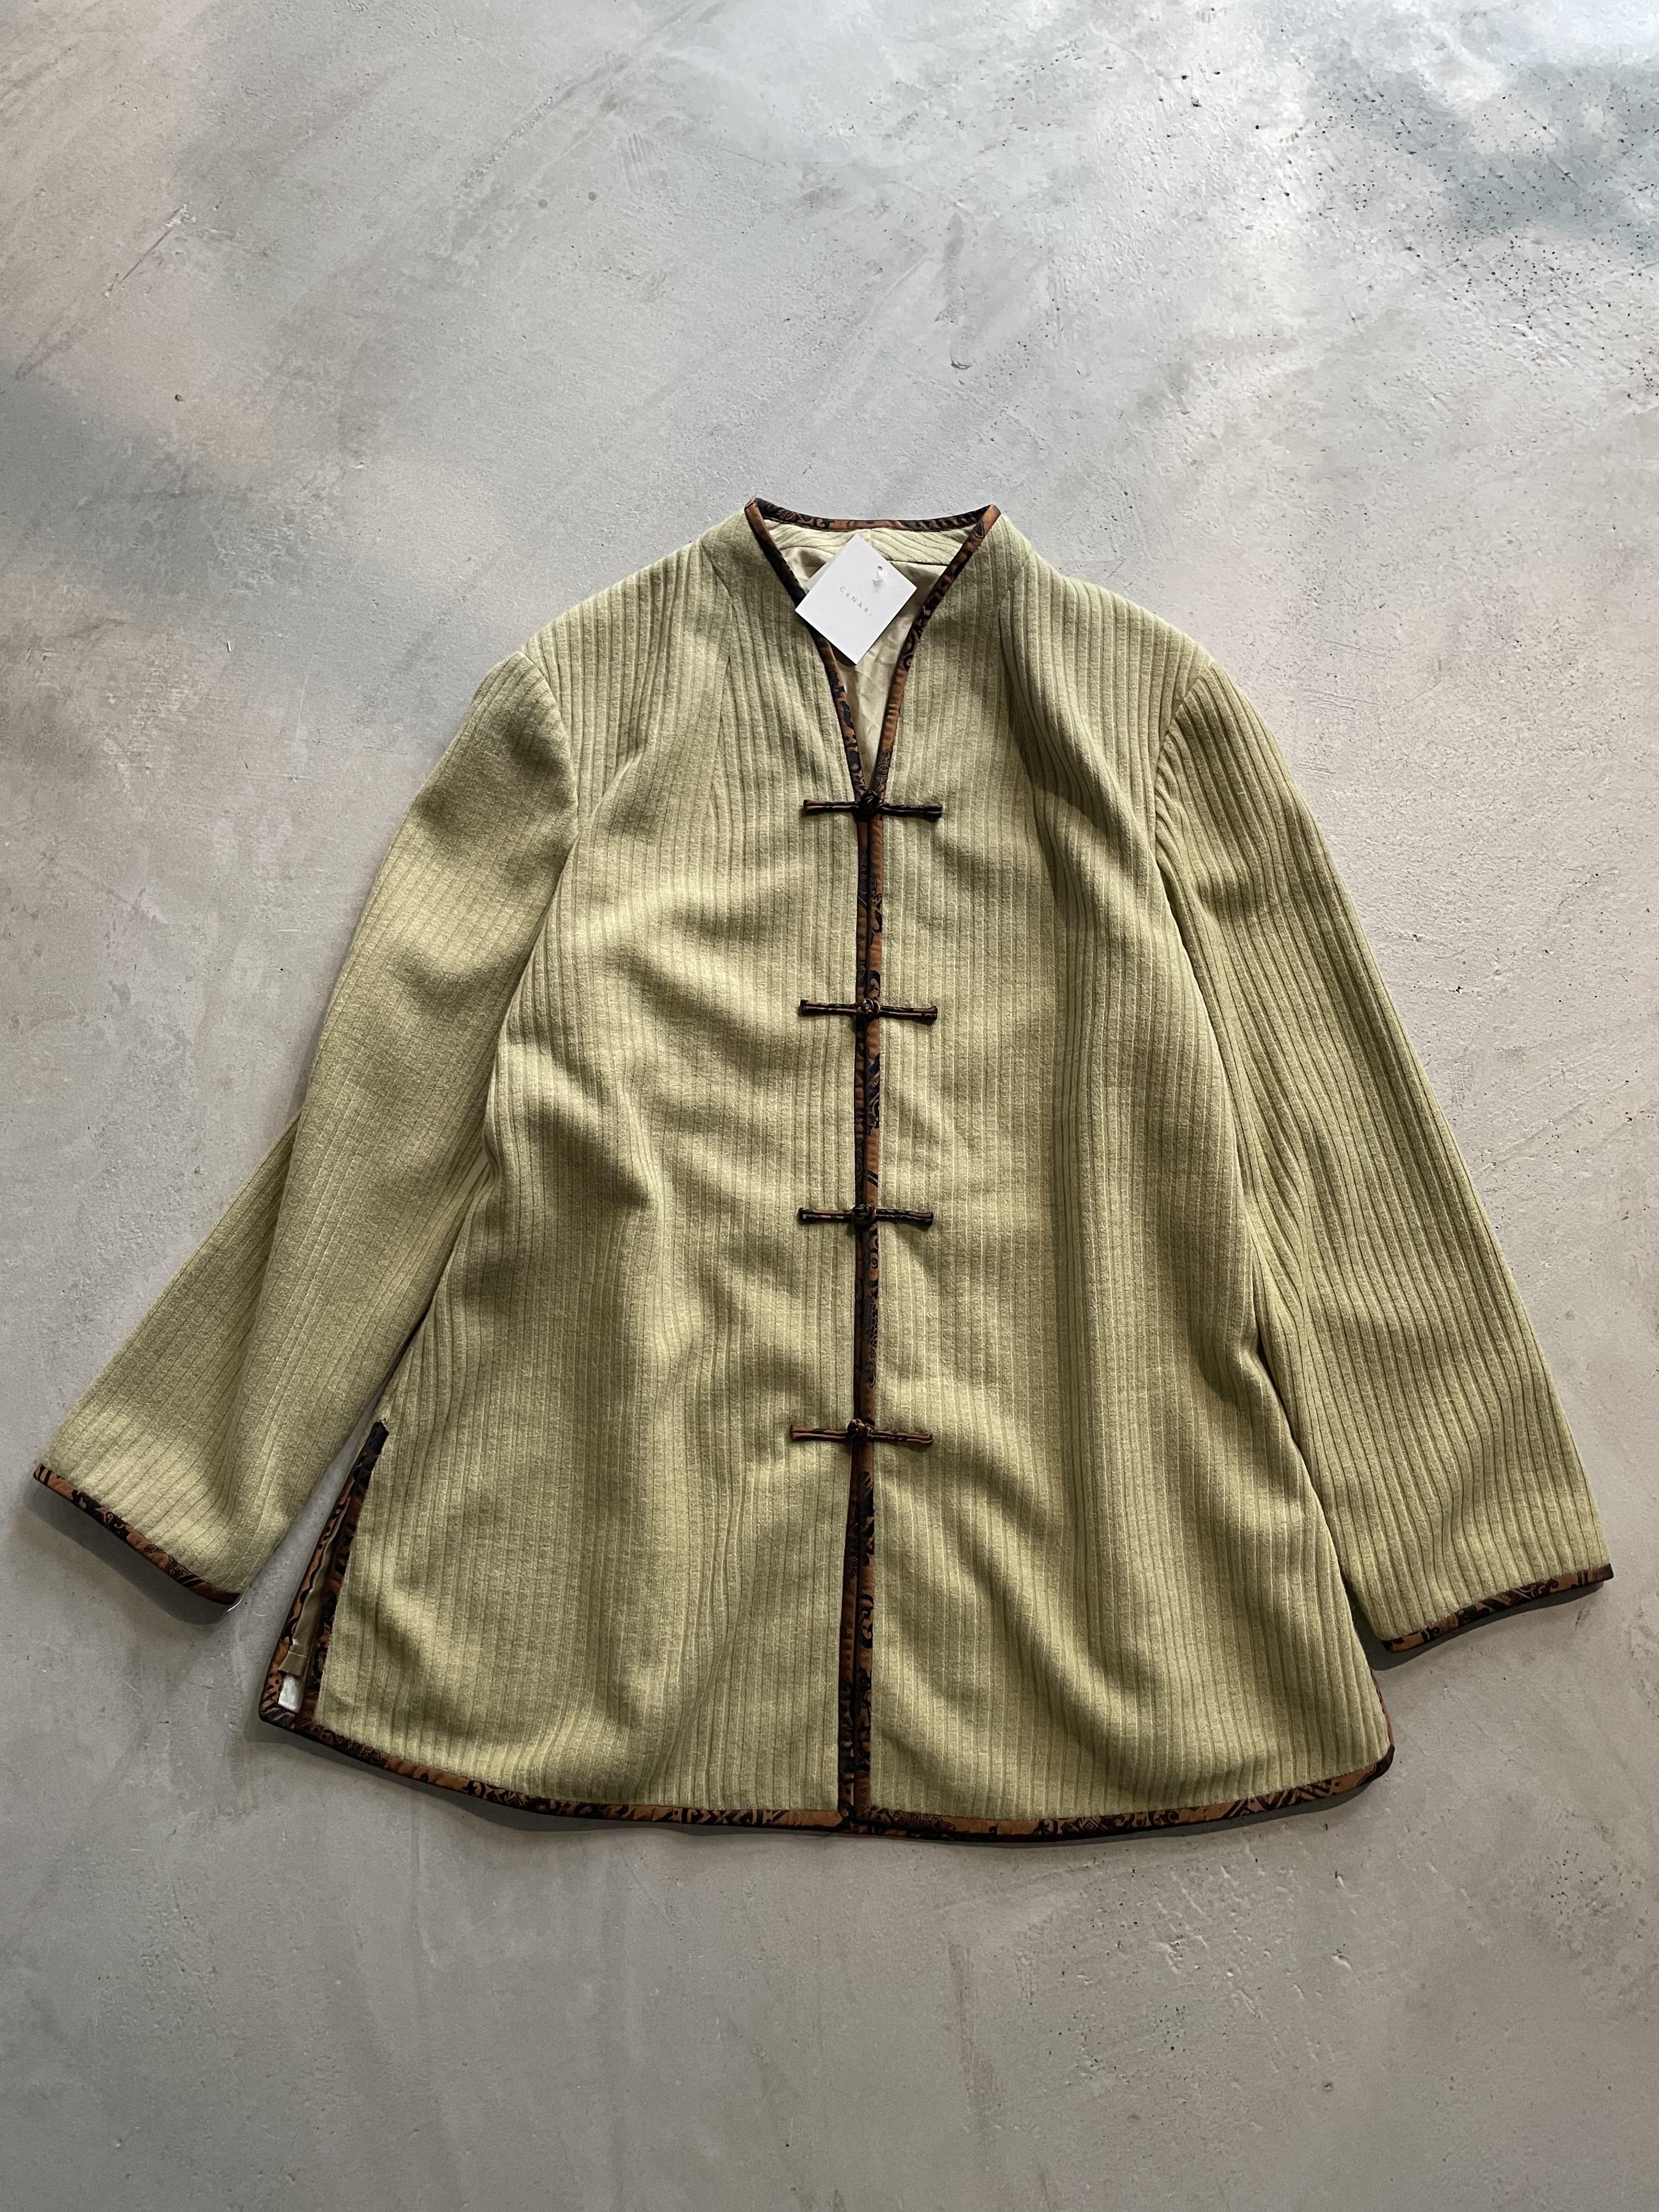 vintage China cardigan